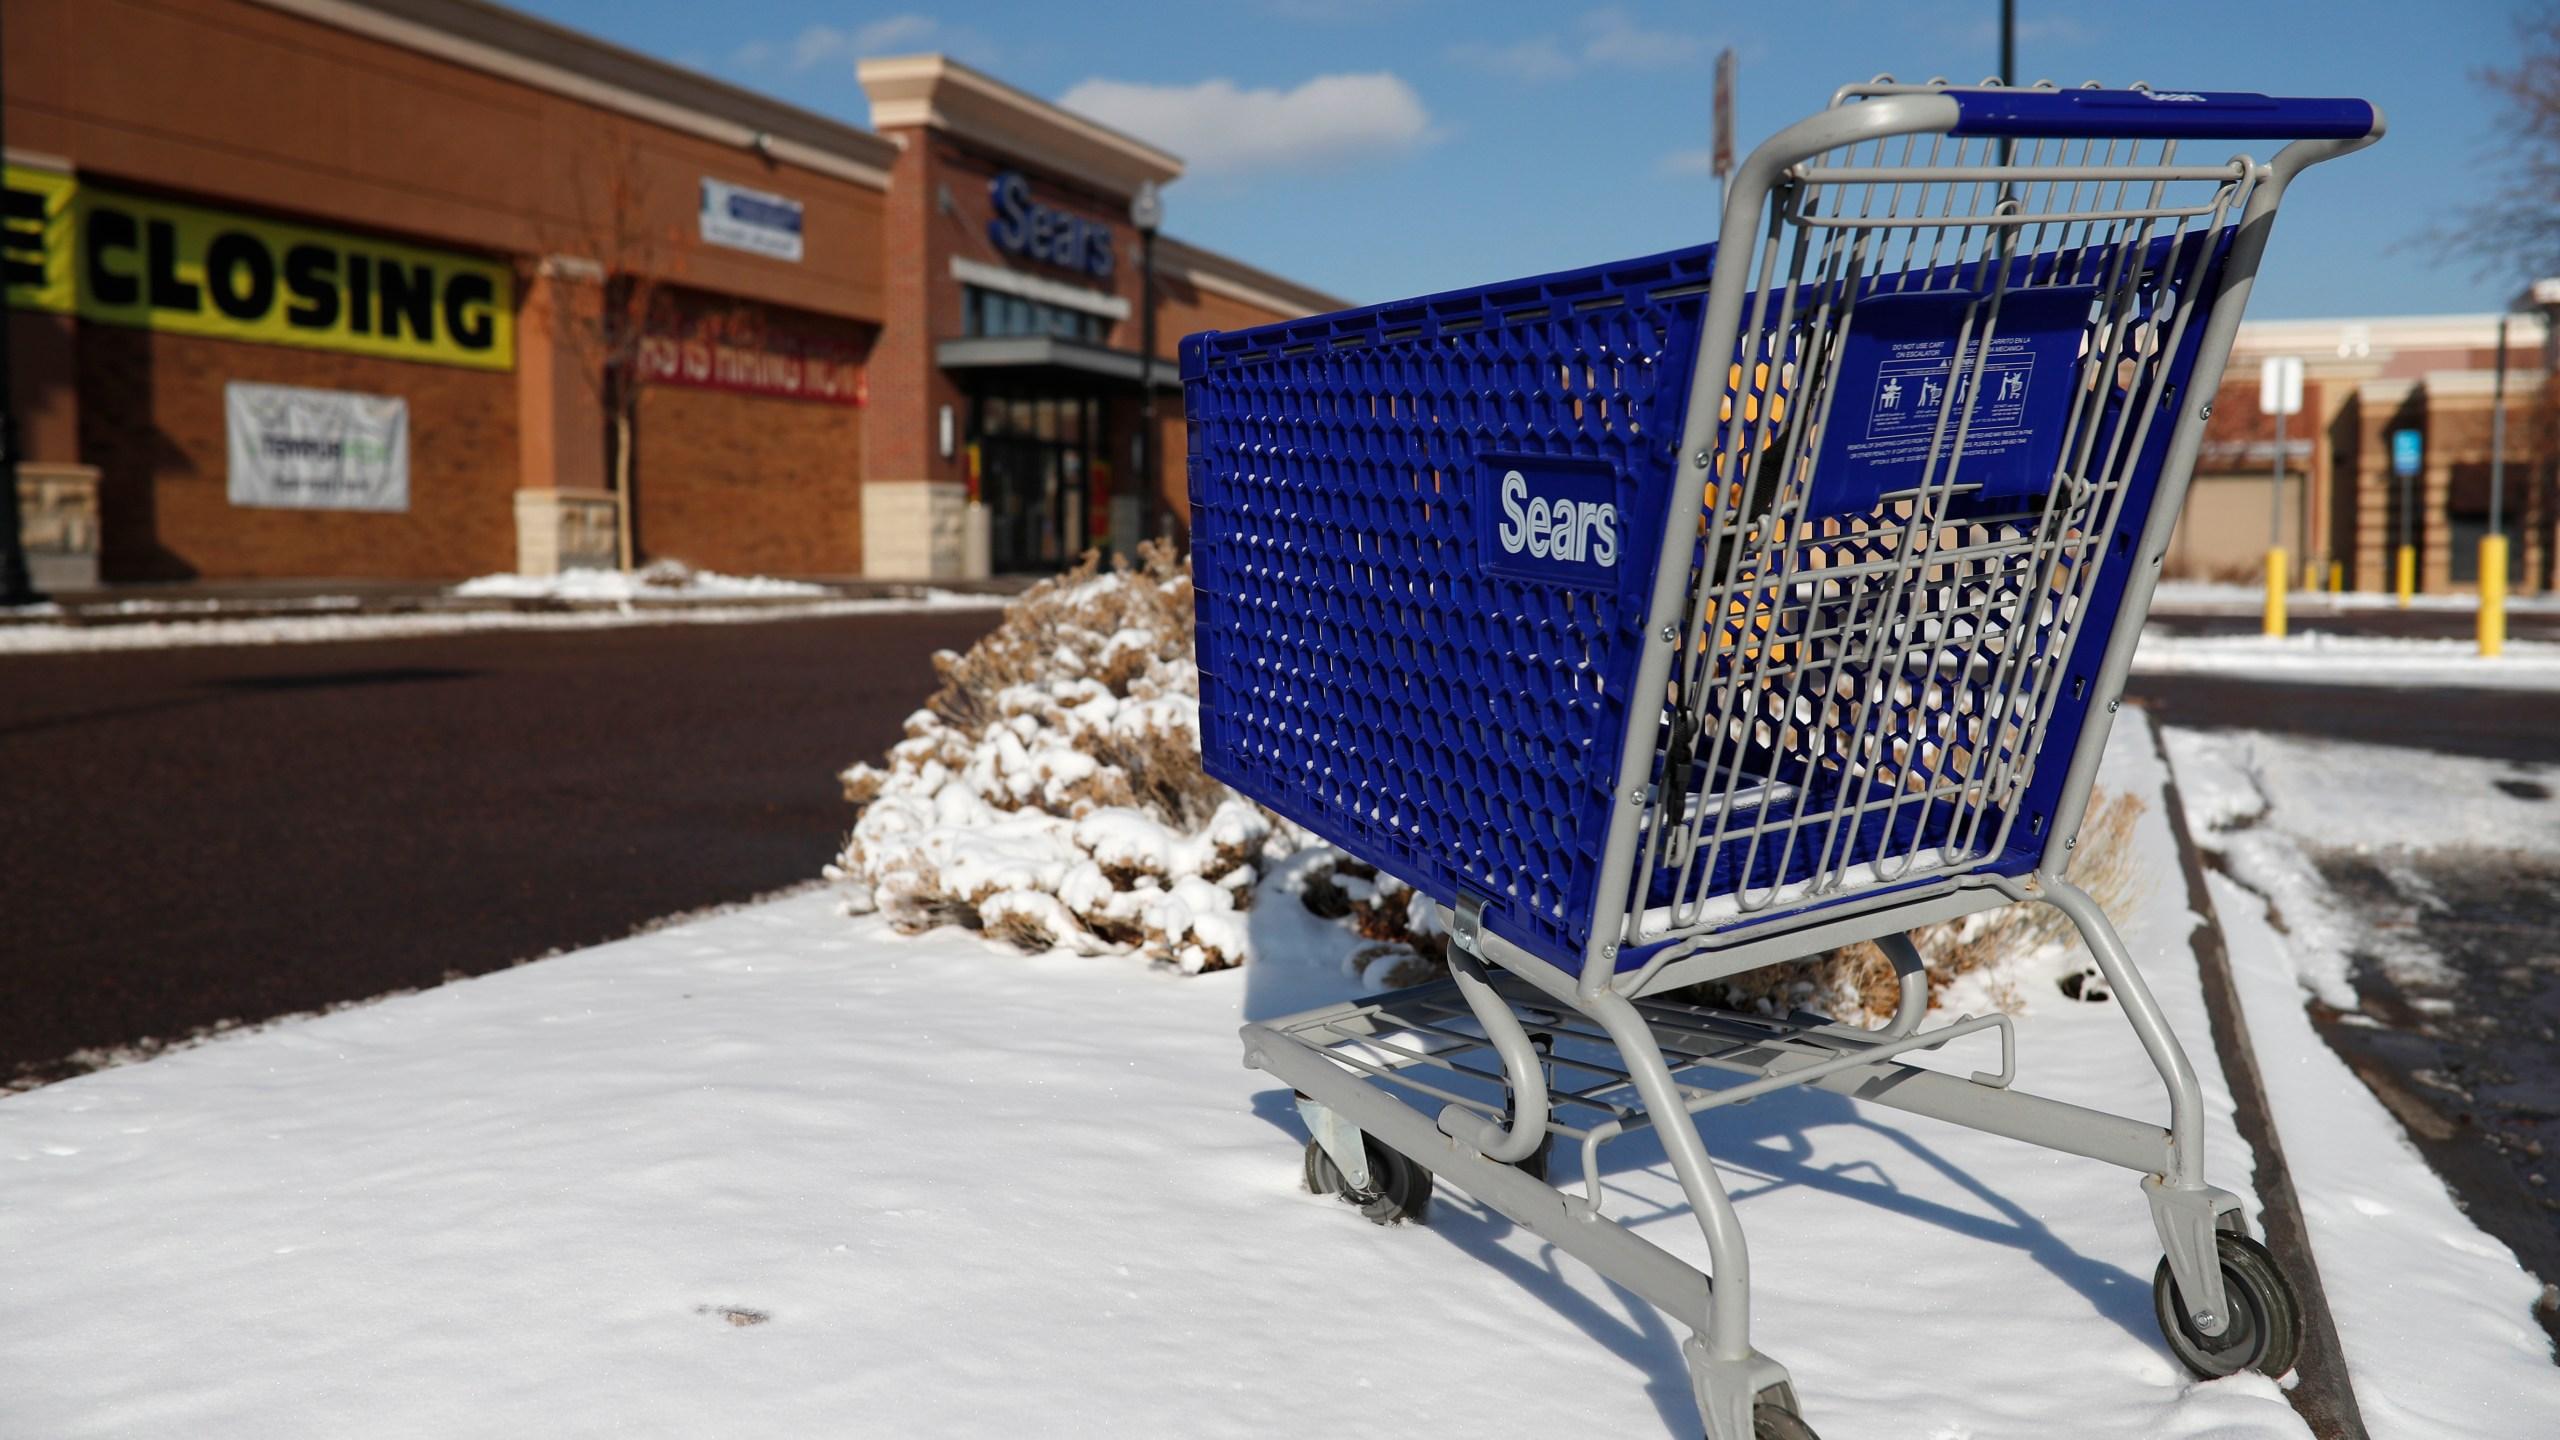 Sears store Streets of Southglenn, shopping cart, Sears store in Streets of Southglenn